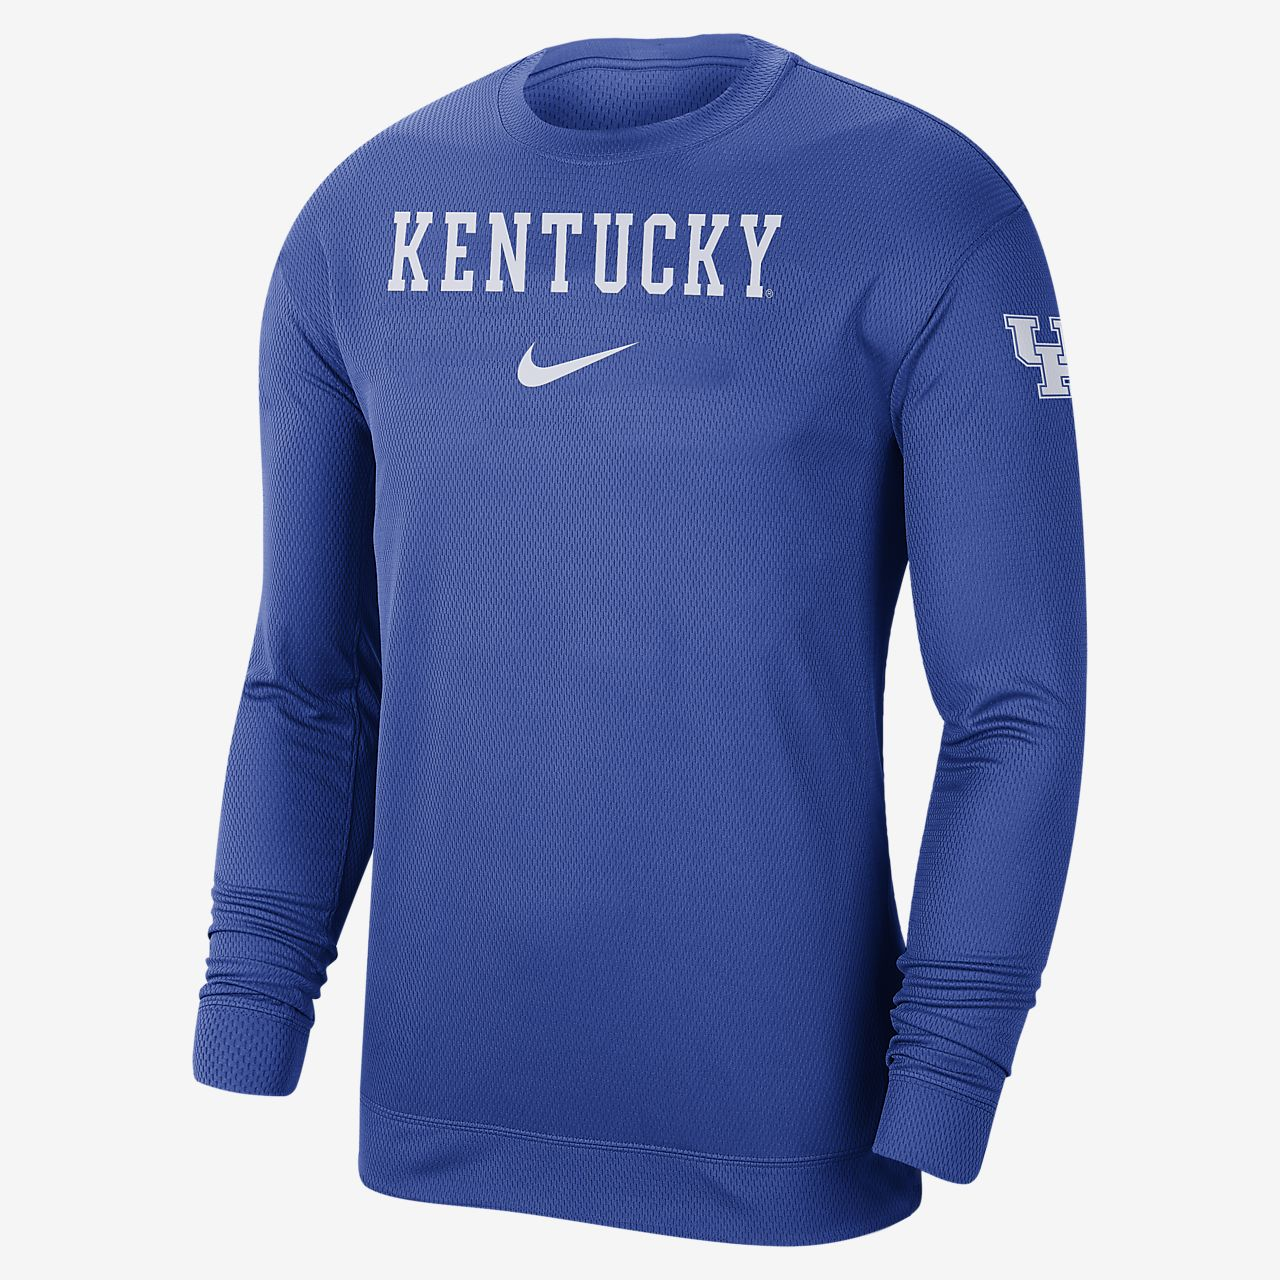 Nike College Dri-FIT Spotlight (Kentucky) Men's Long-Sleeve Top